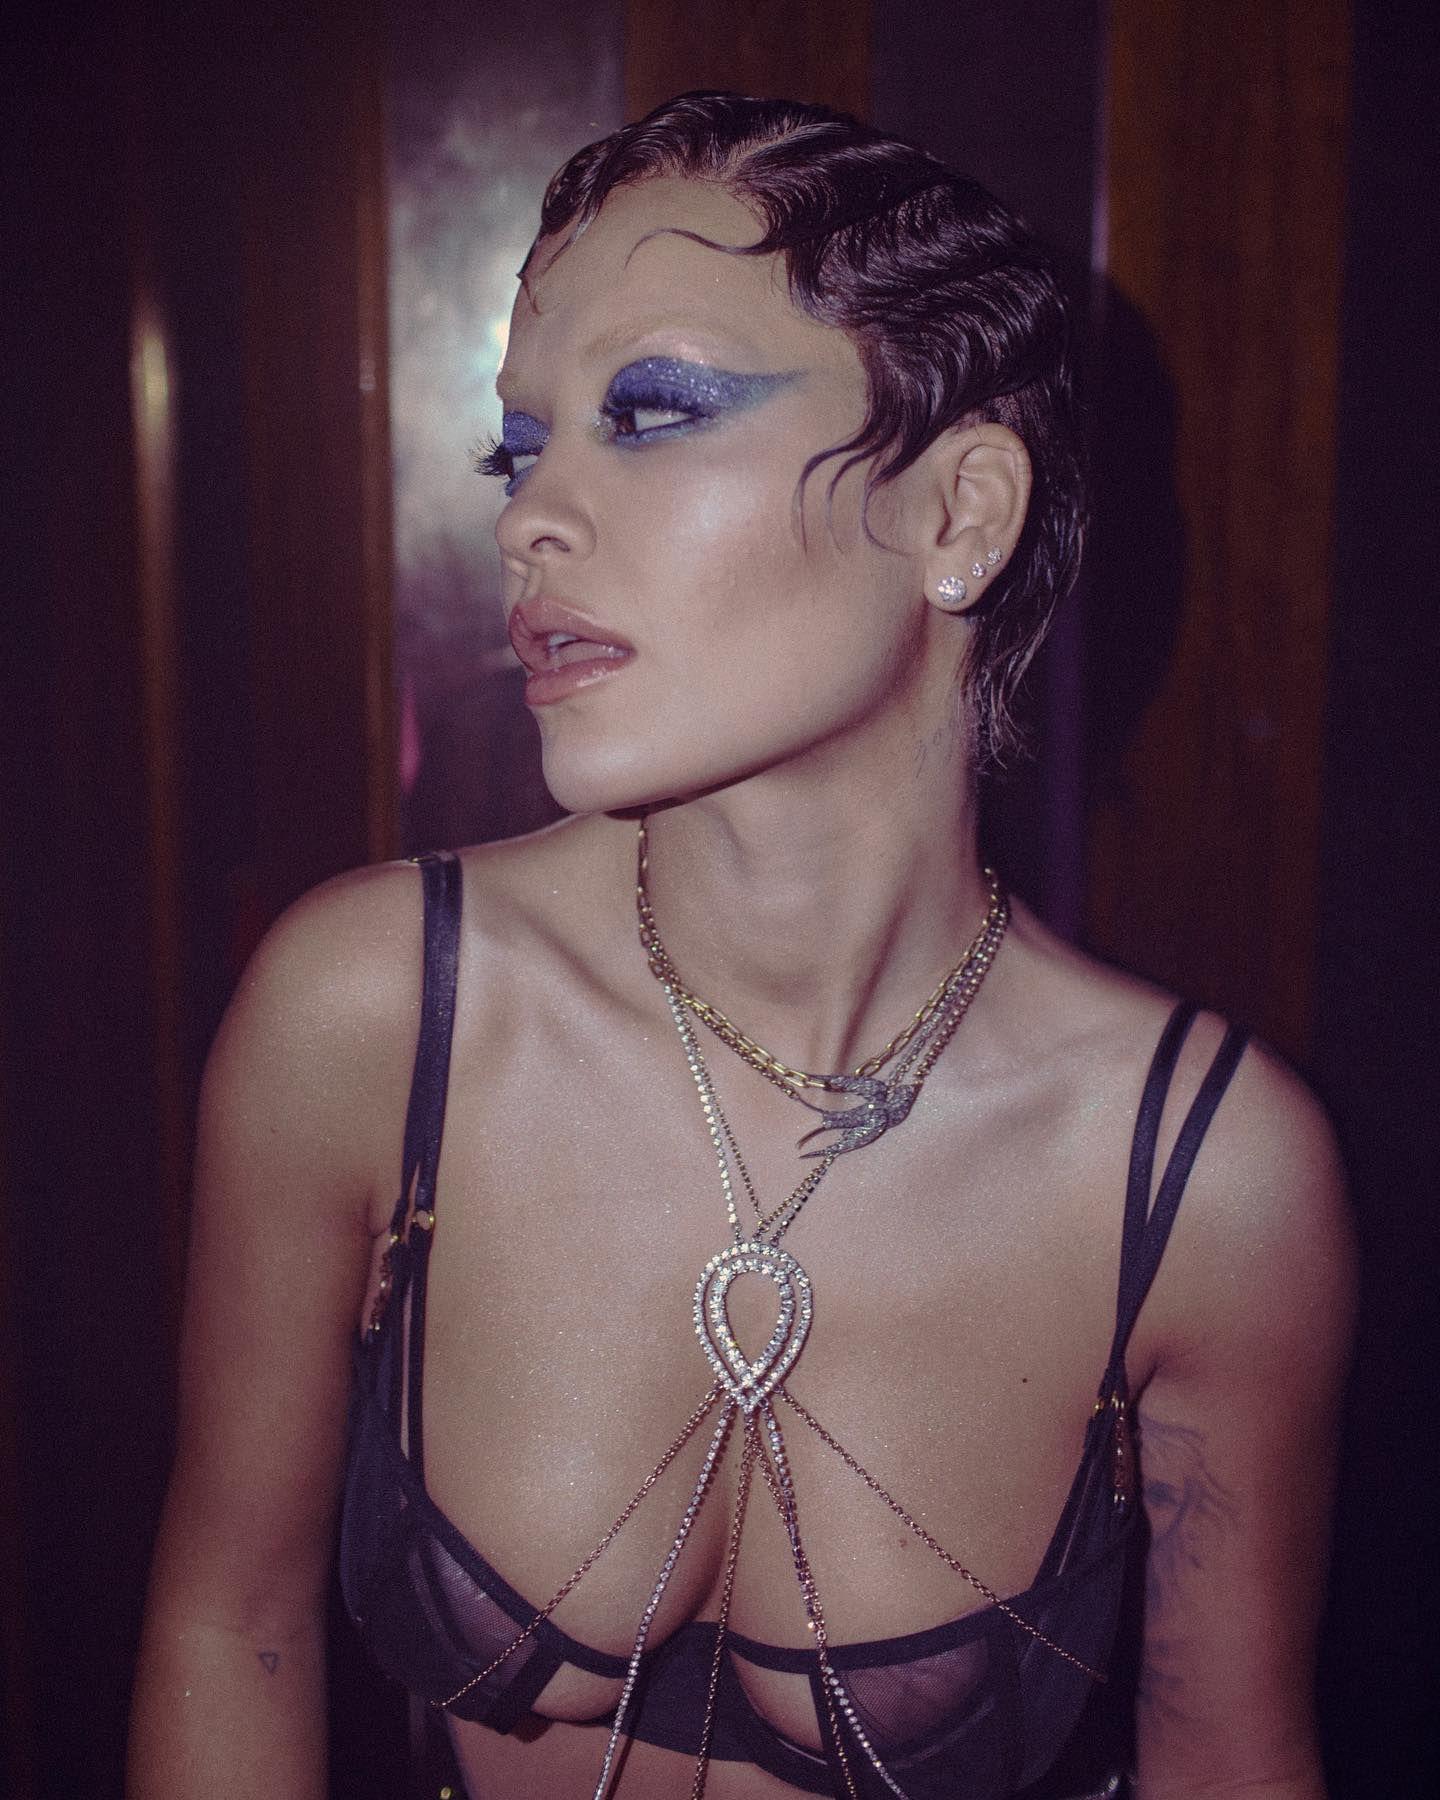 Rita Ora In Lingerie